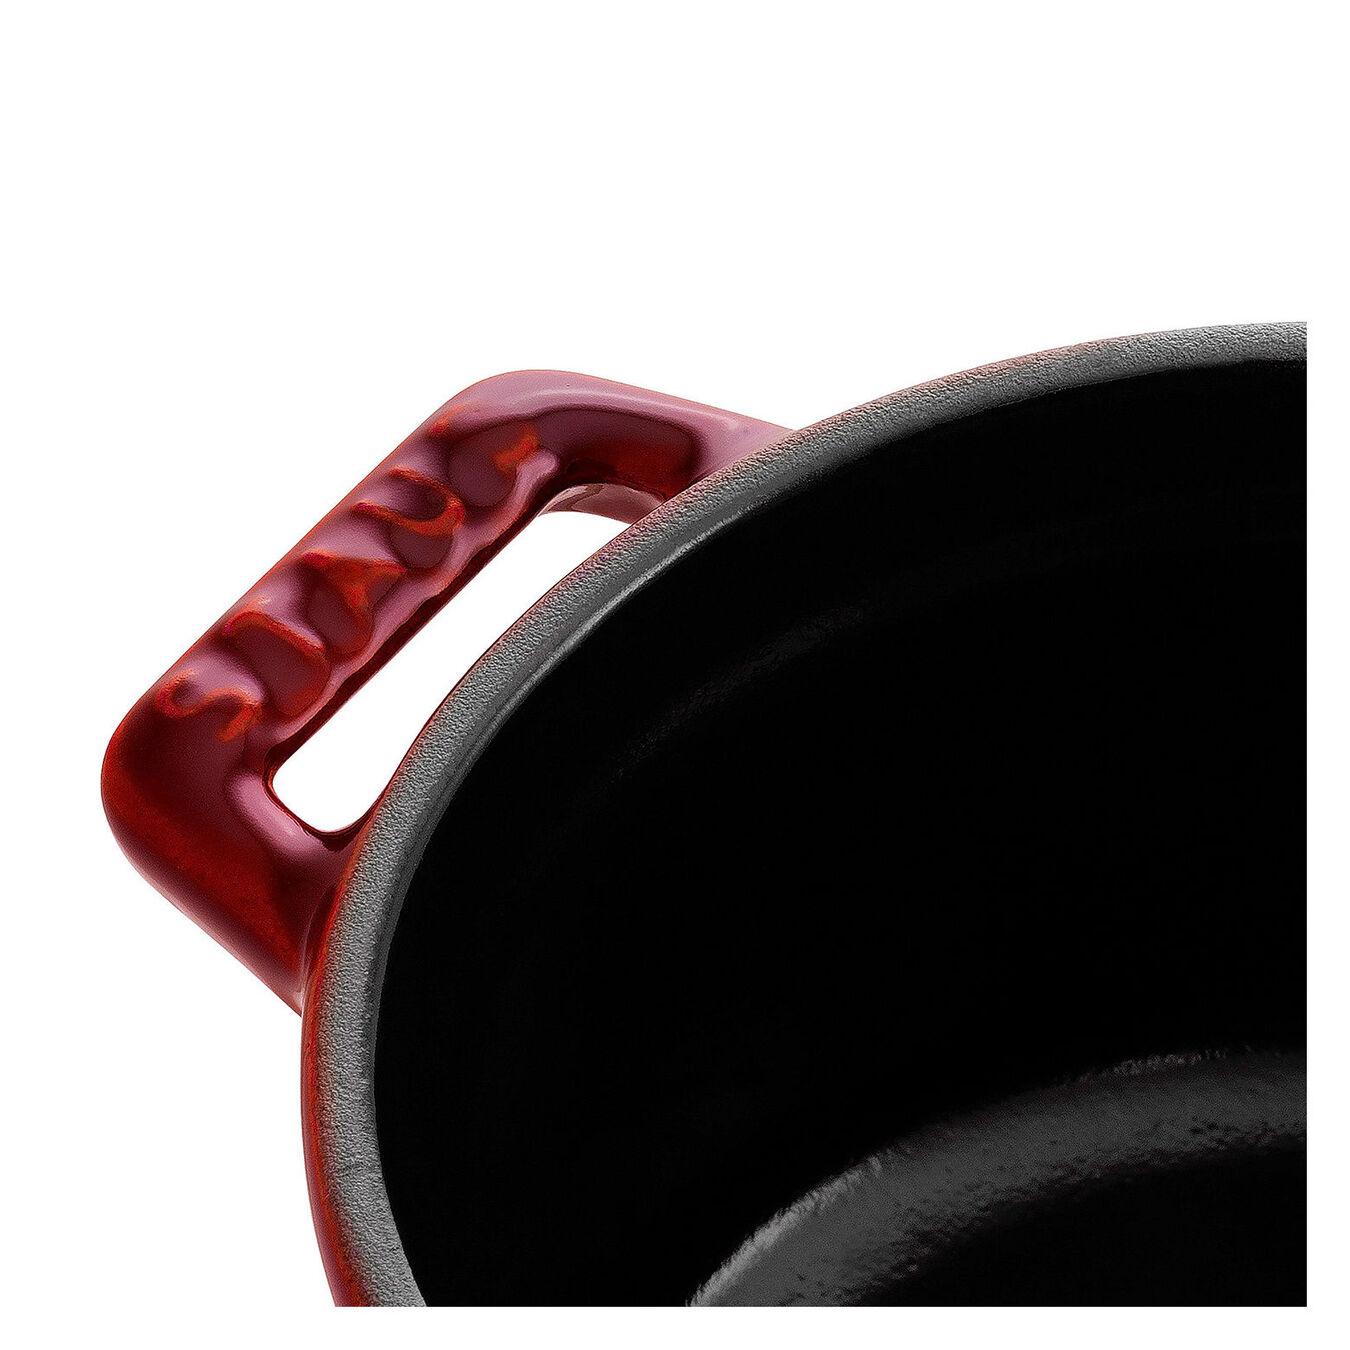 Mini cocotte rotonda - 10 cm, granatina,,large 3